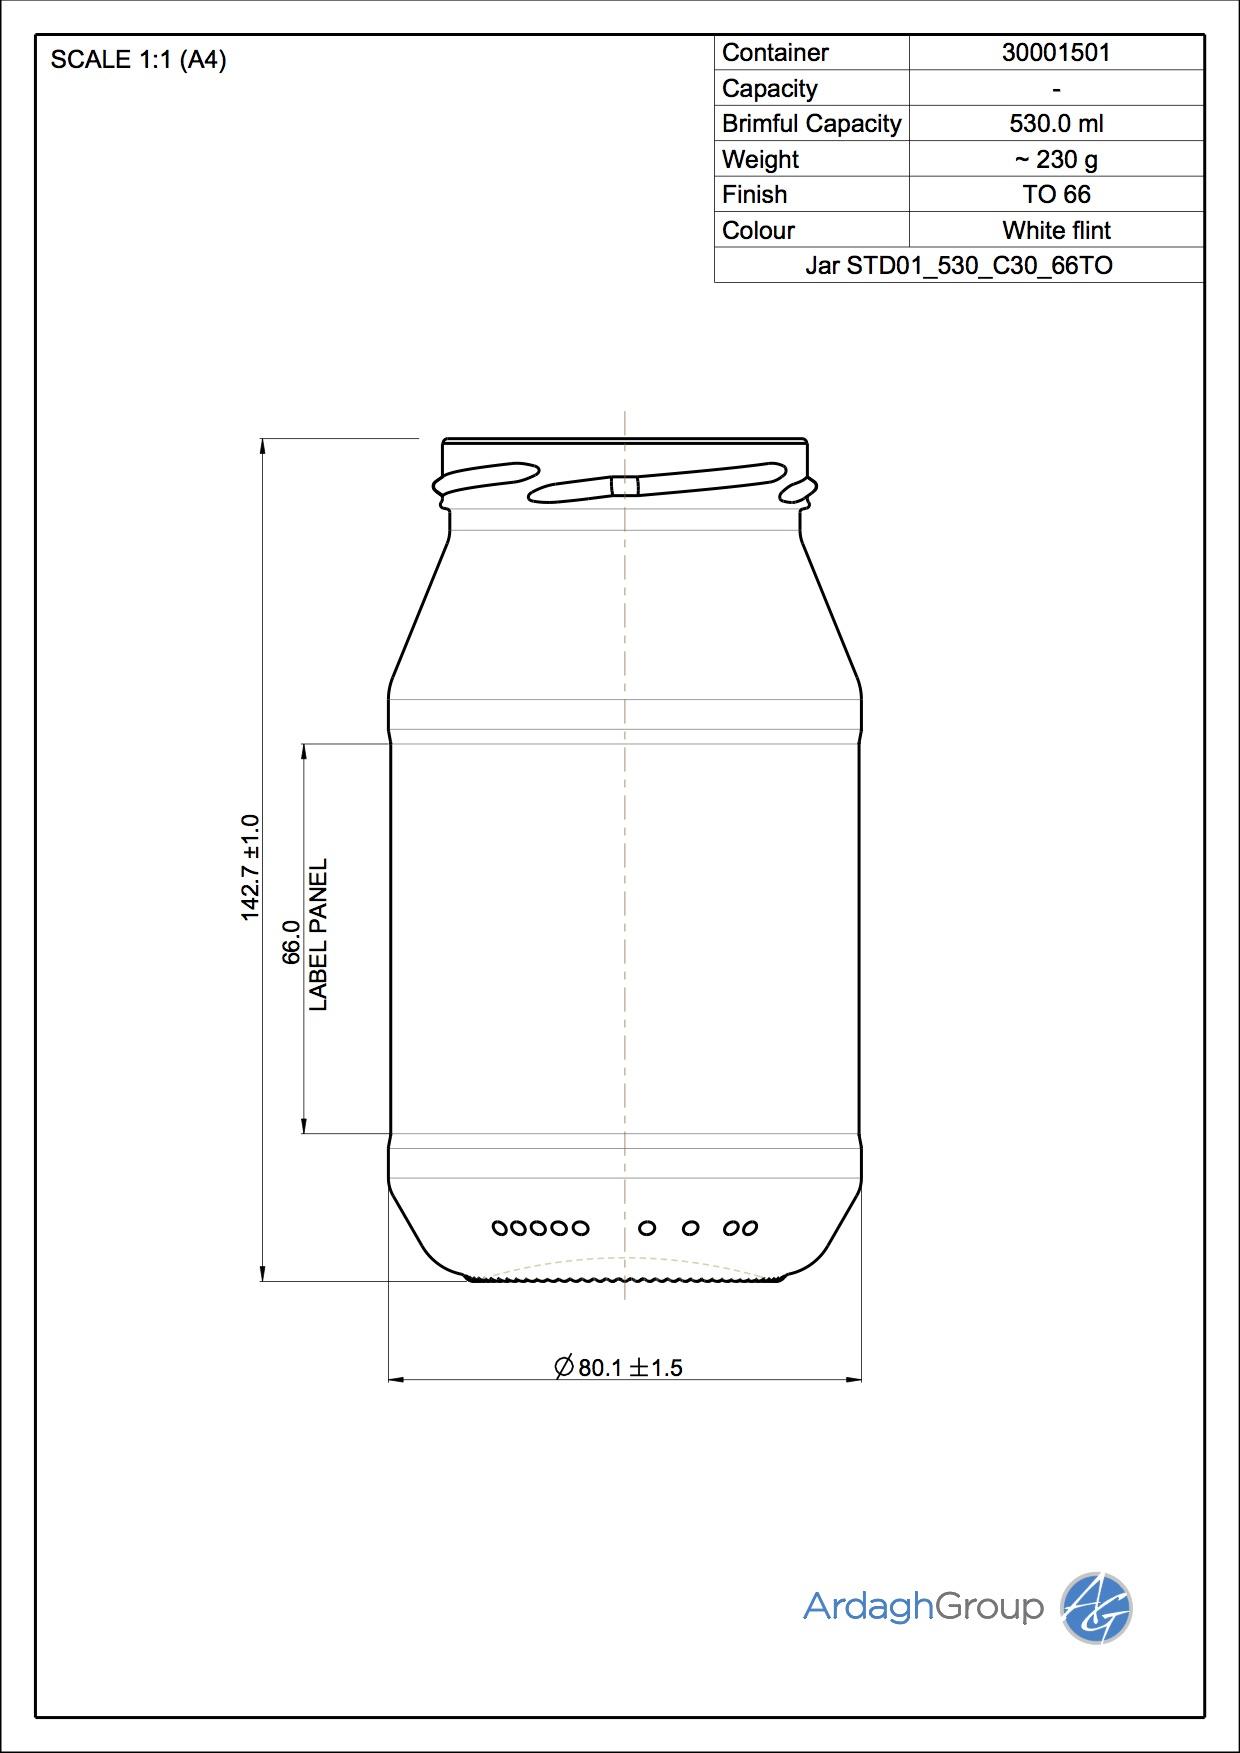 Jar STD01 530 C30 66TO